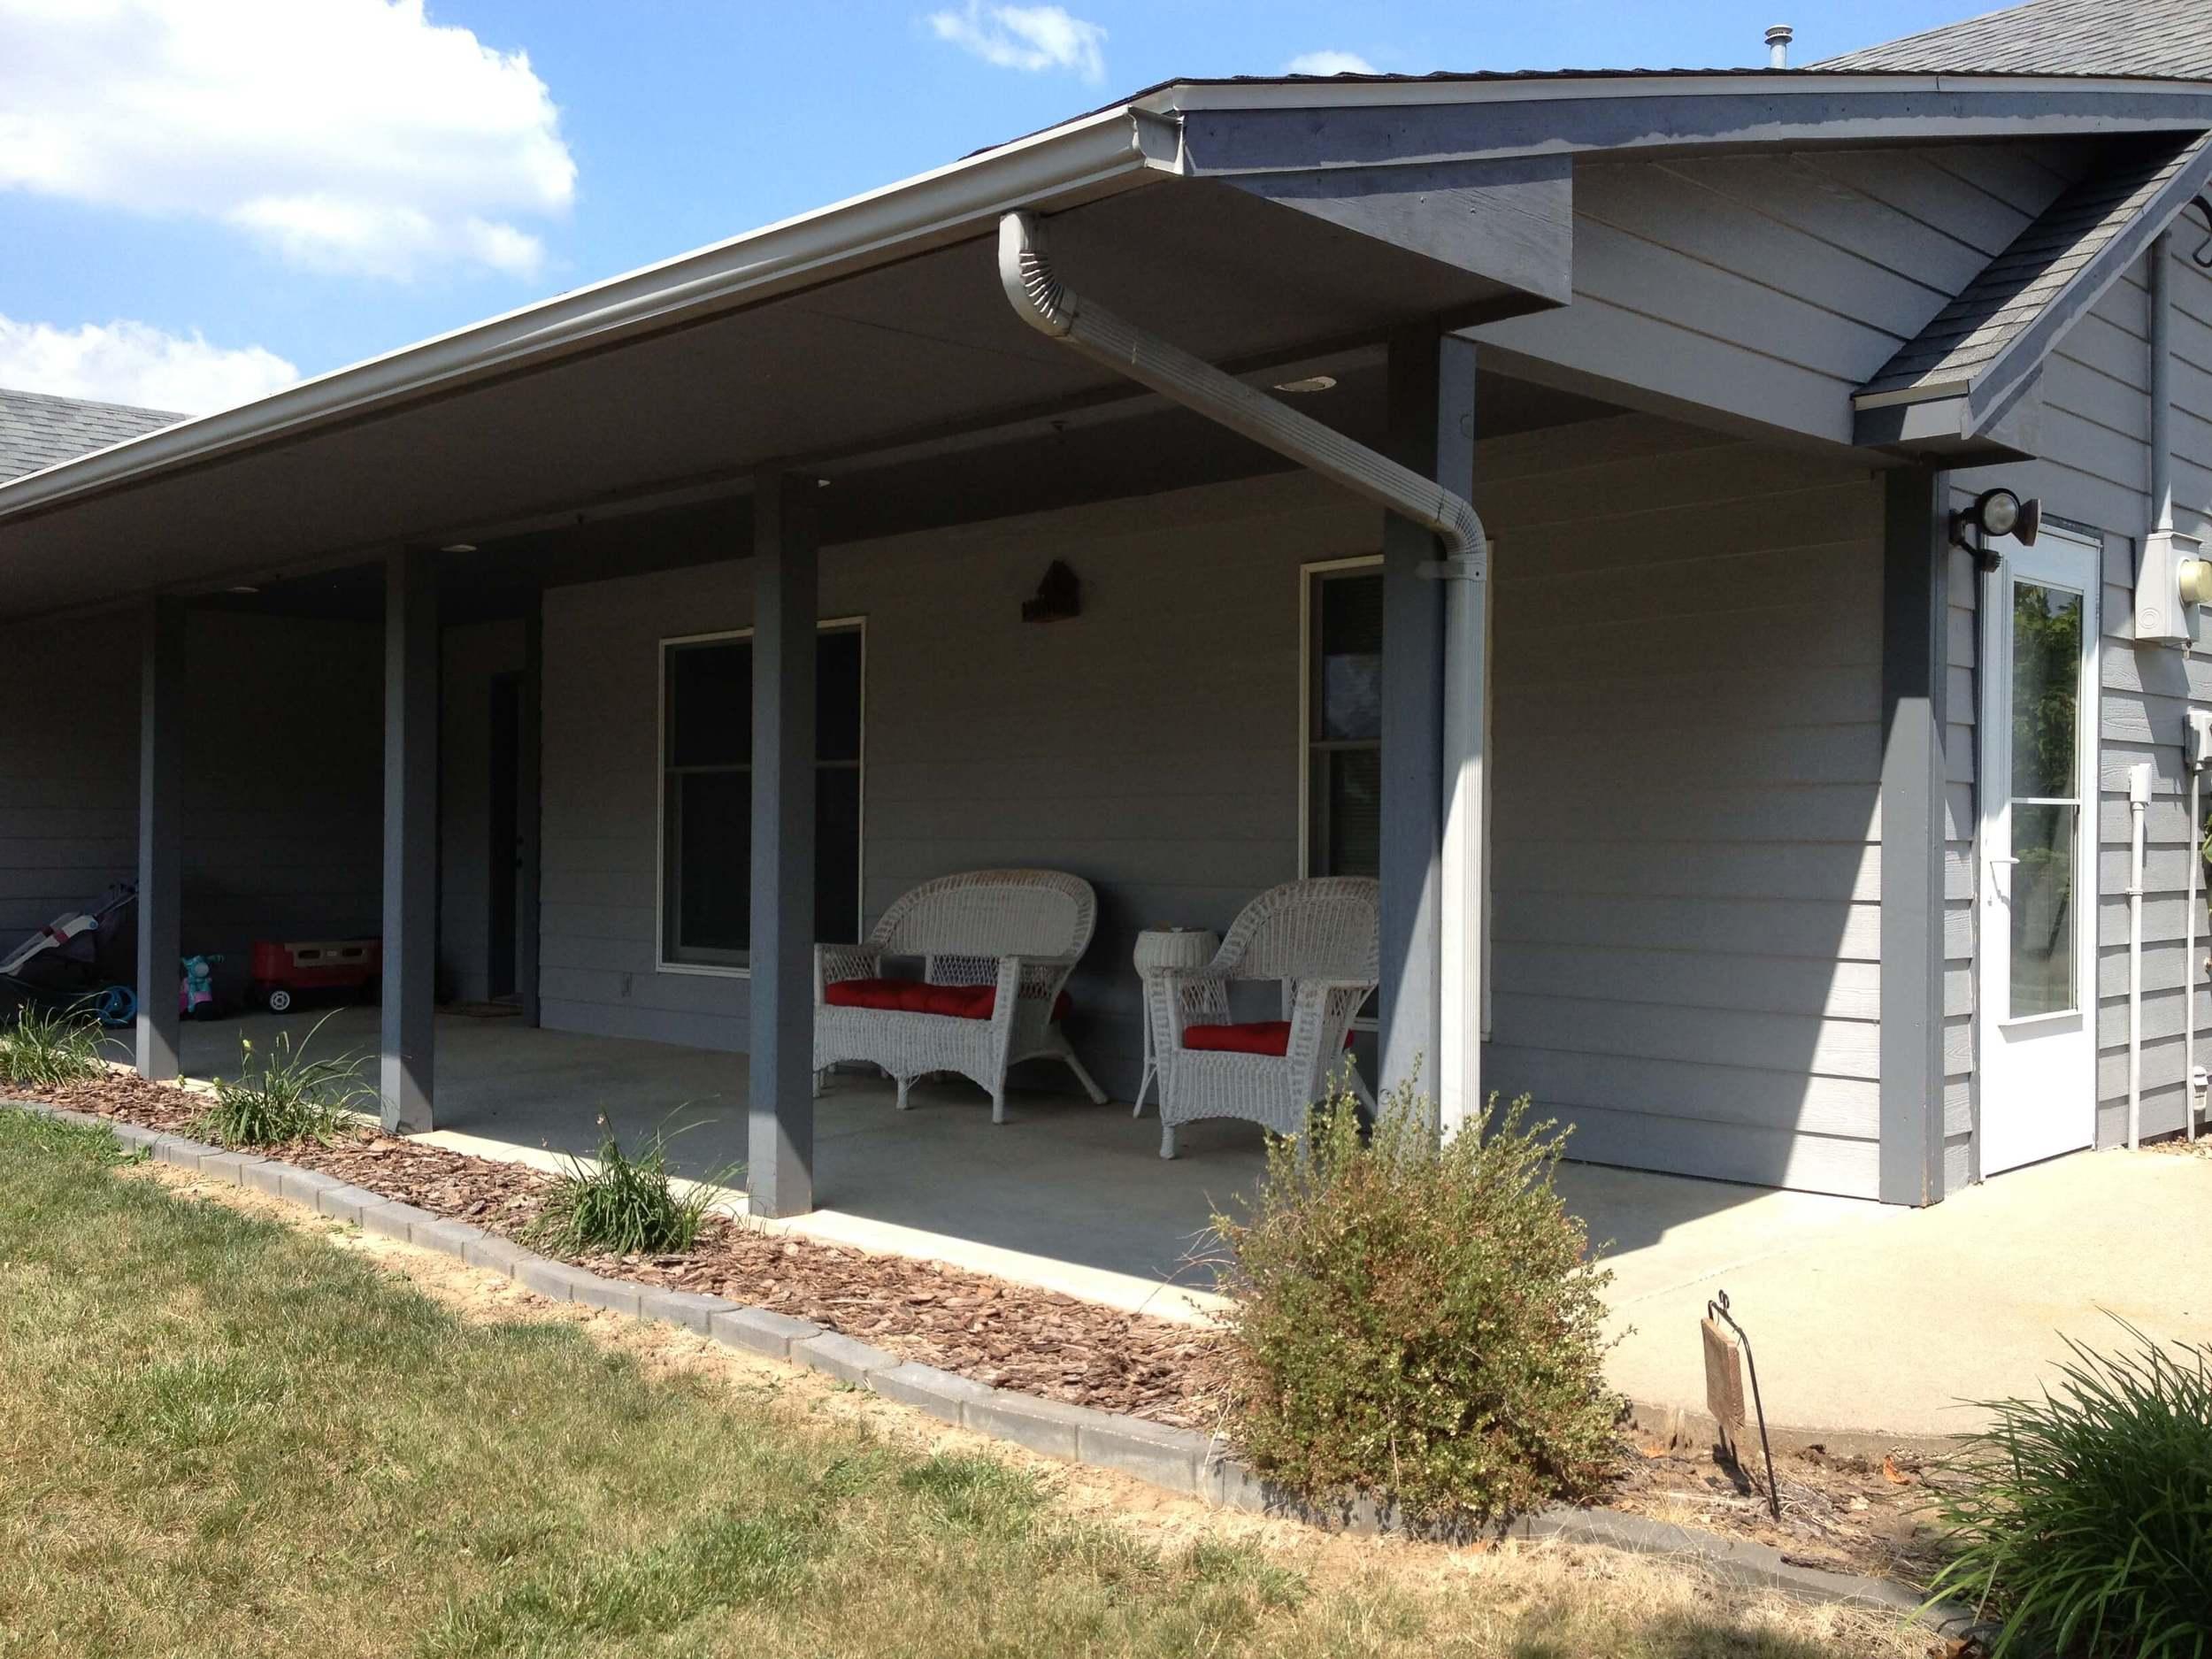 How paint exterior of house - DaytoDayAdventures.com